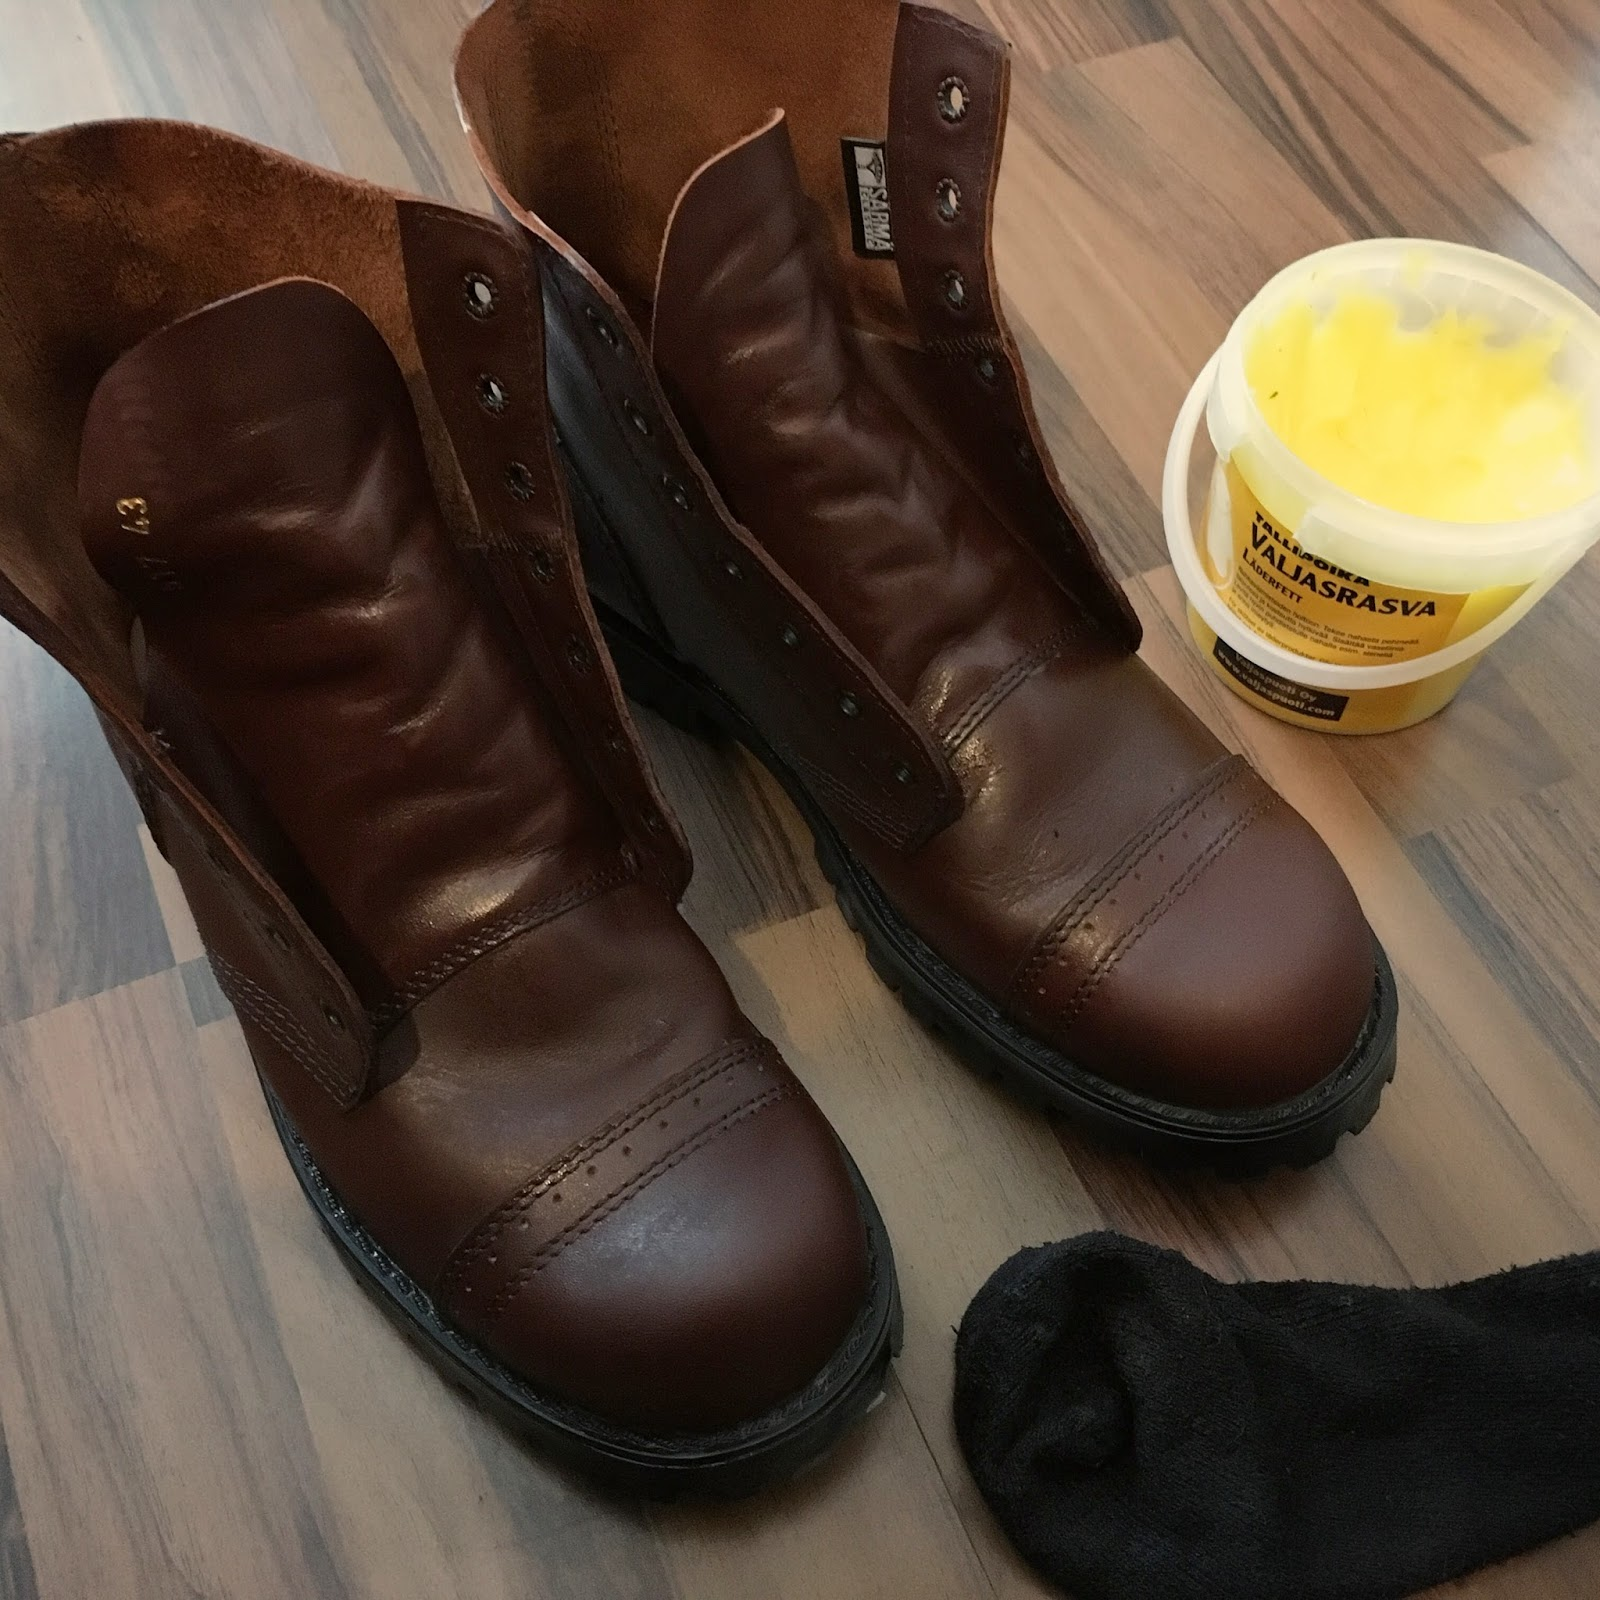 Vastarasvatut kengät ja valjasrasvapurkki 51df219cb7